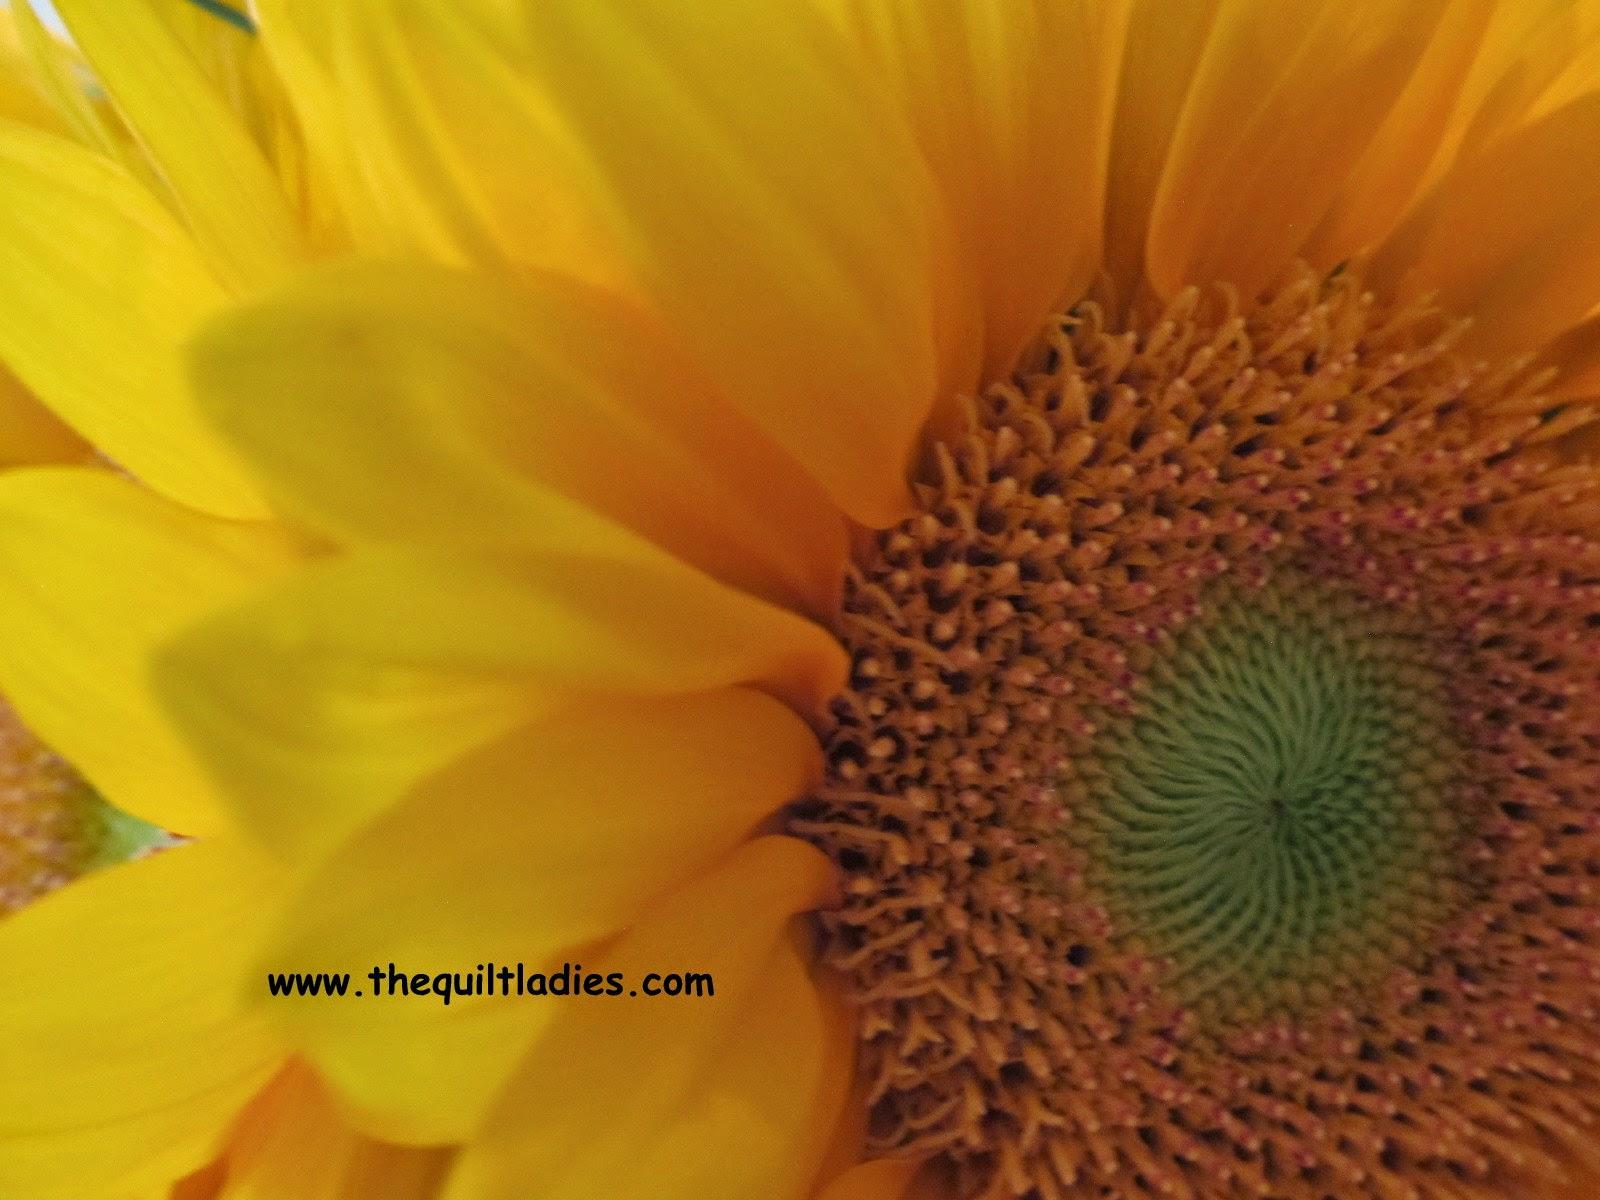 Sun Flower Center Beth Ann Strub (c) All Rights Reserved